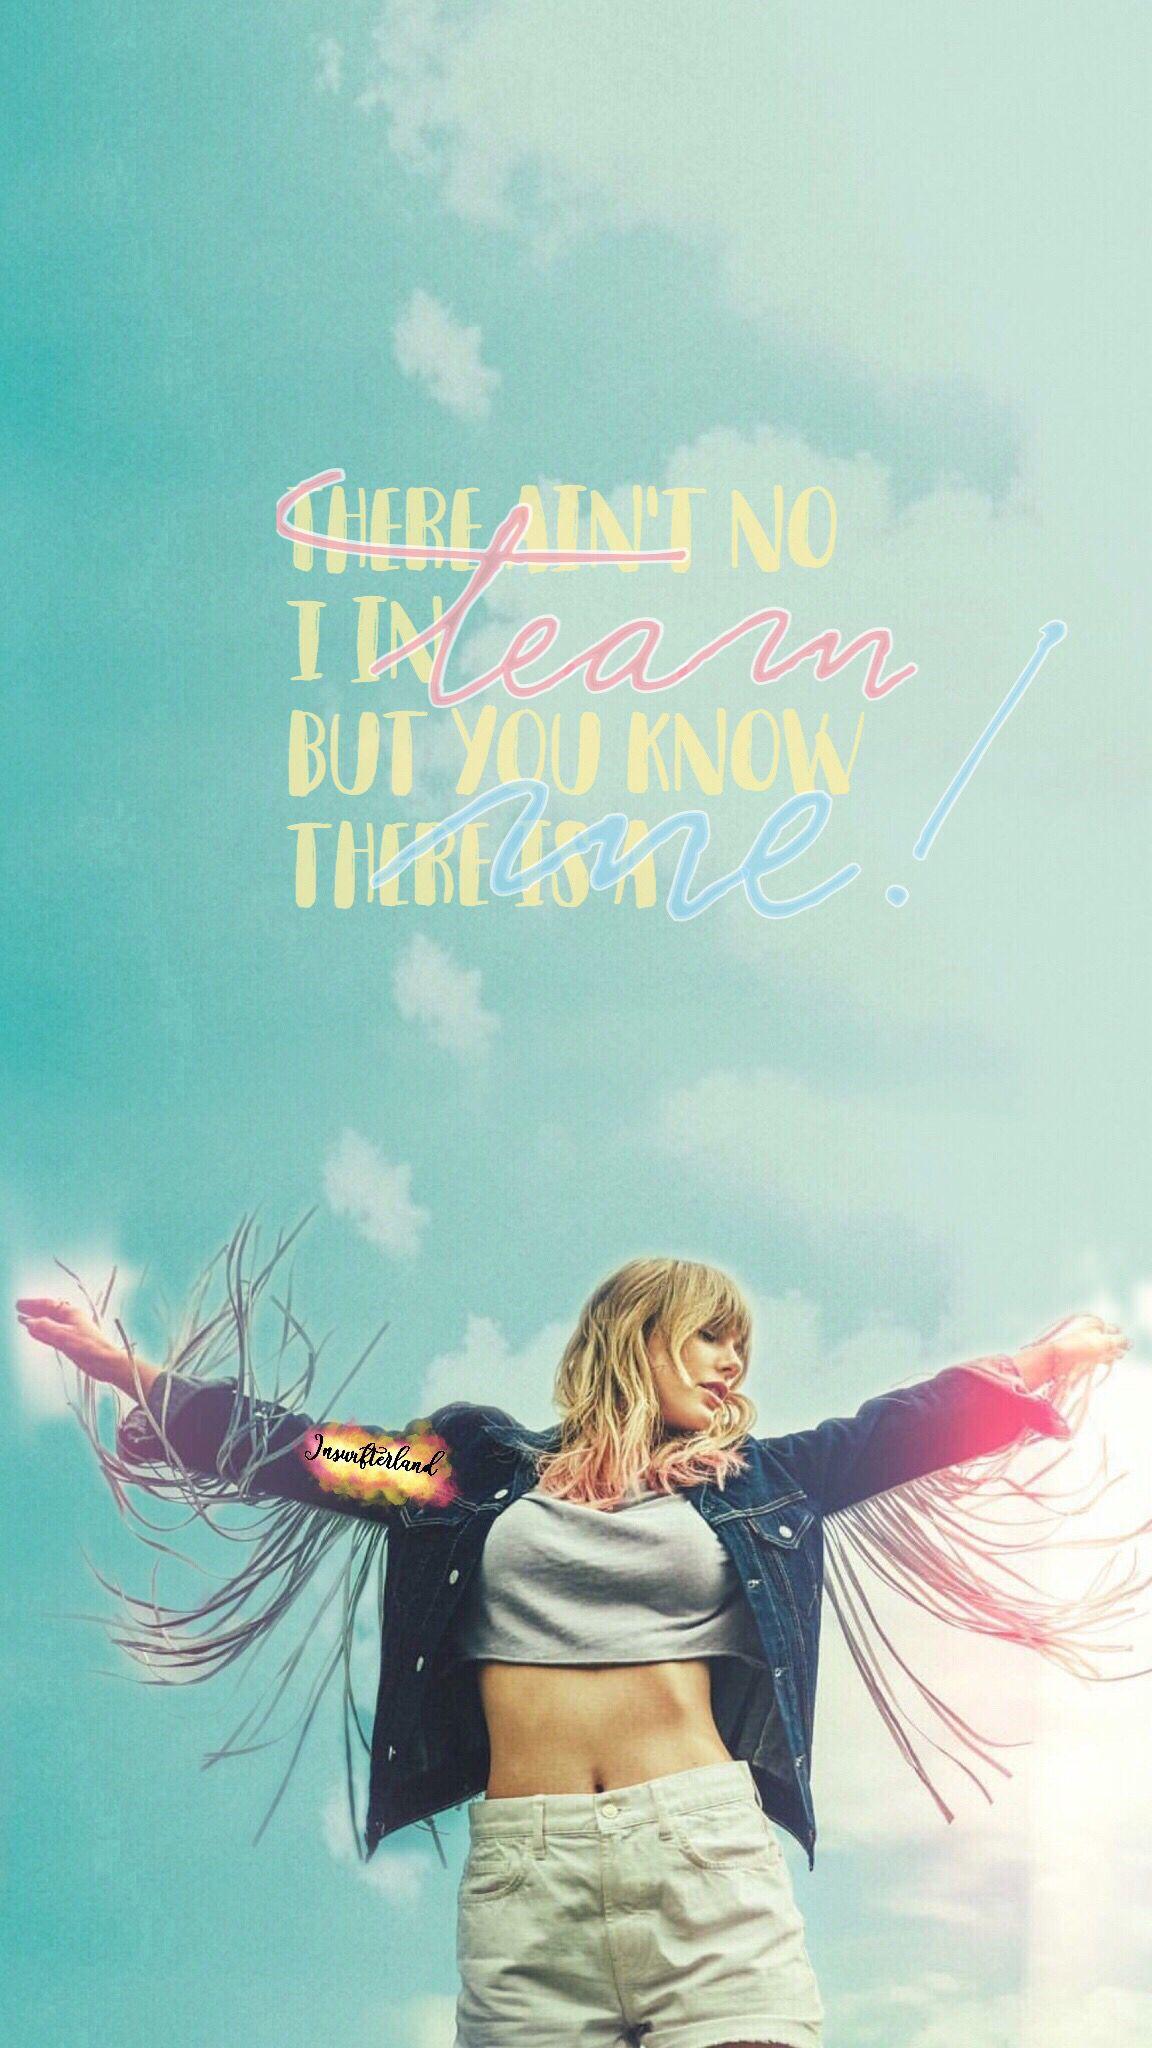 Pin By Serena Swiftie On Ts7 Lover Taylor Swift Wallpaper